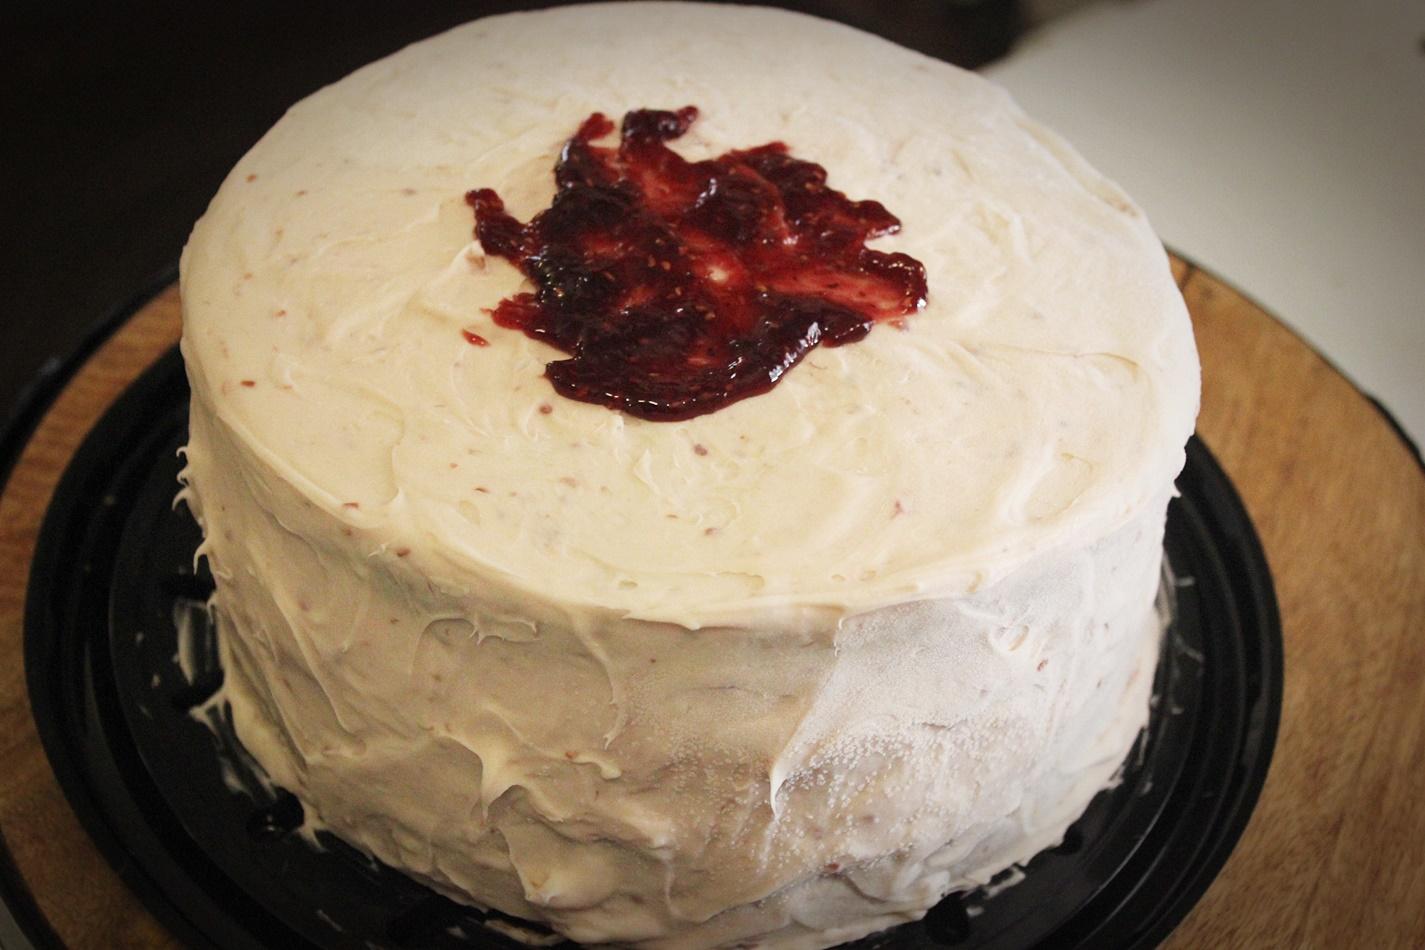 Strawberry(or Raspberry) cream